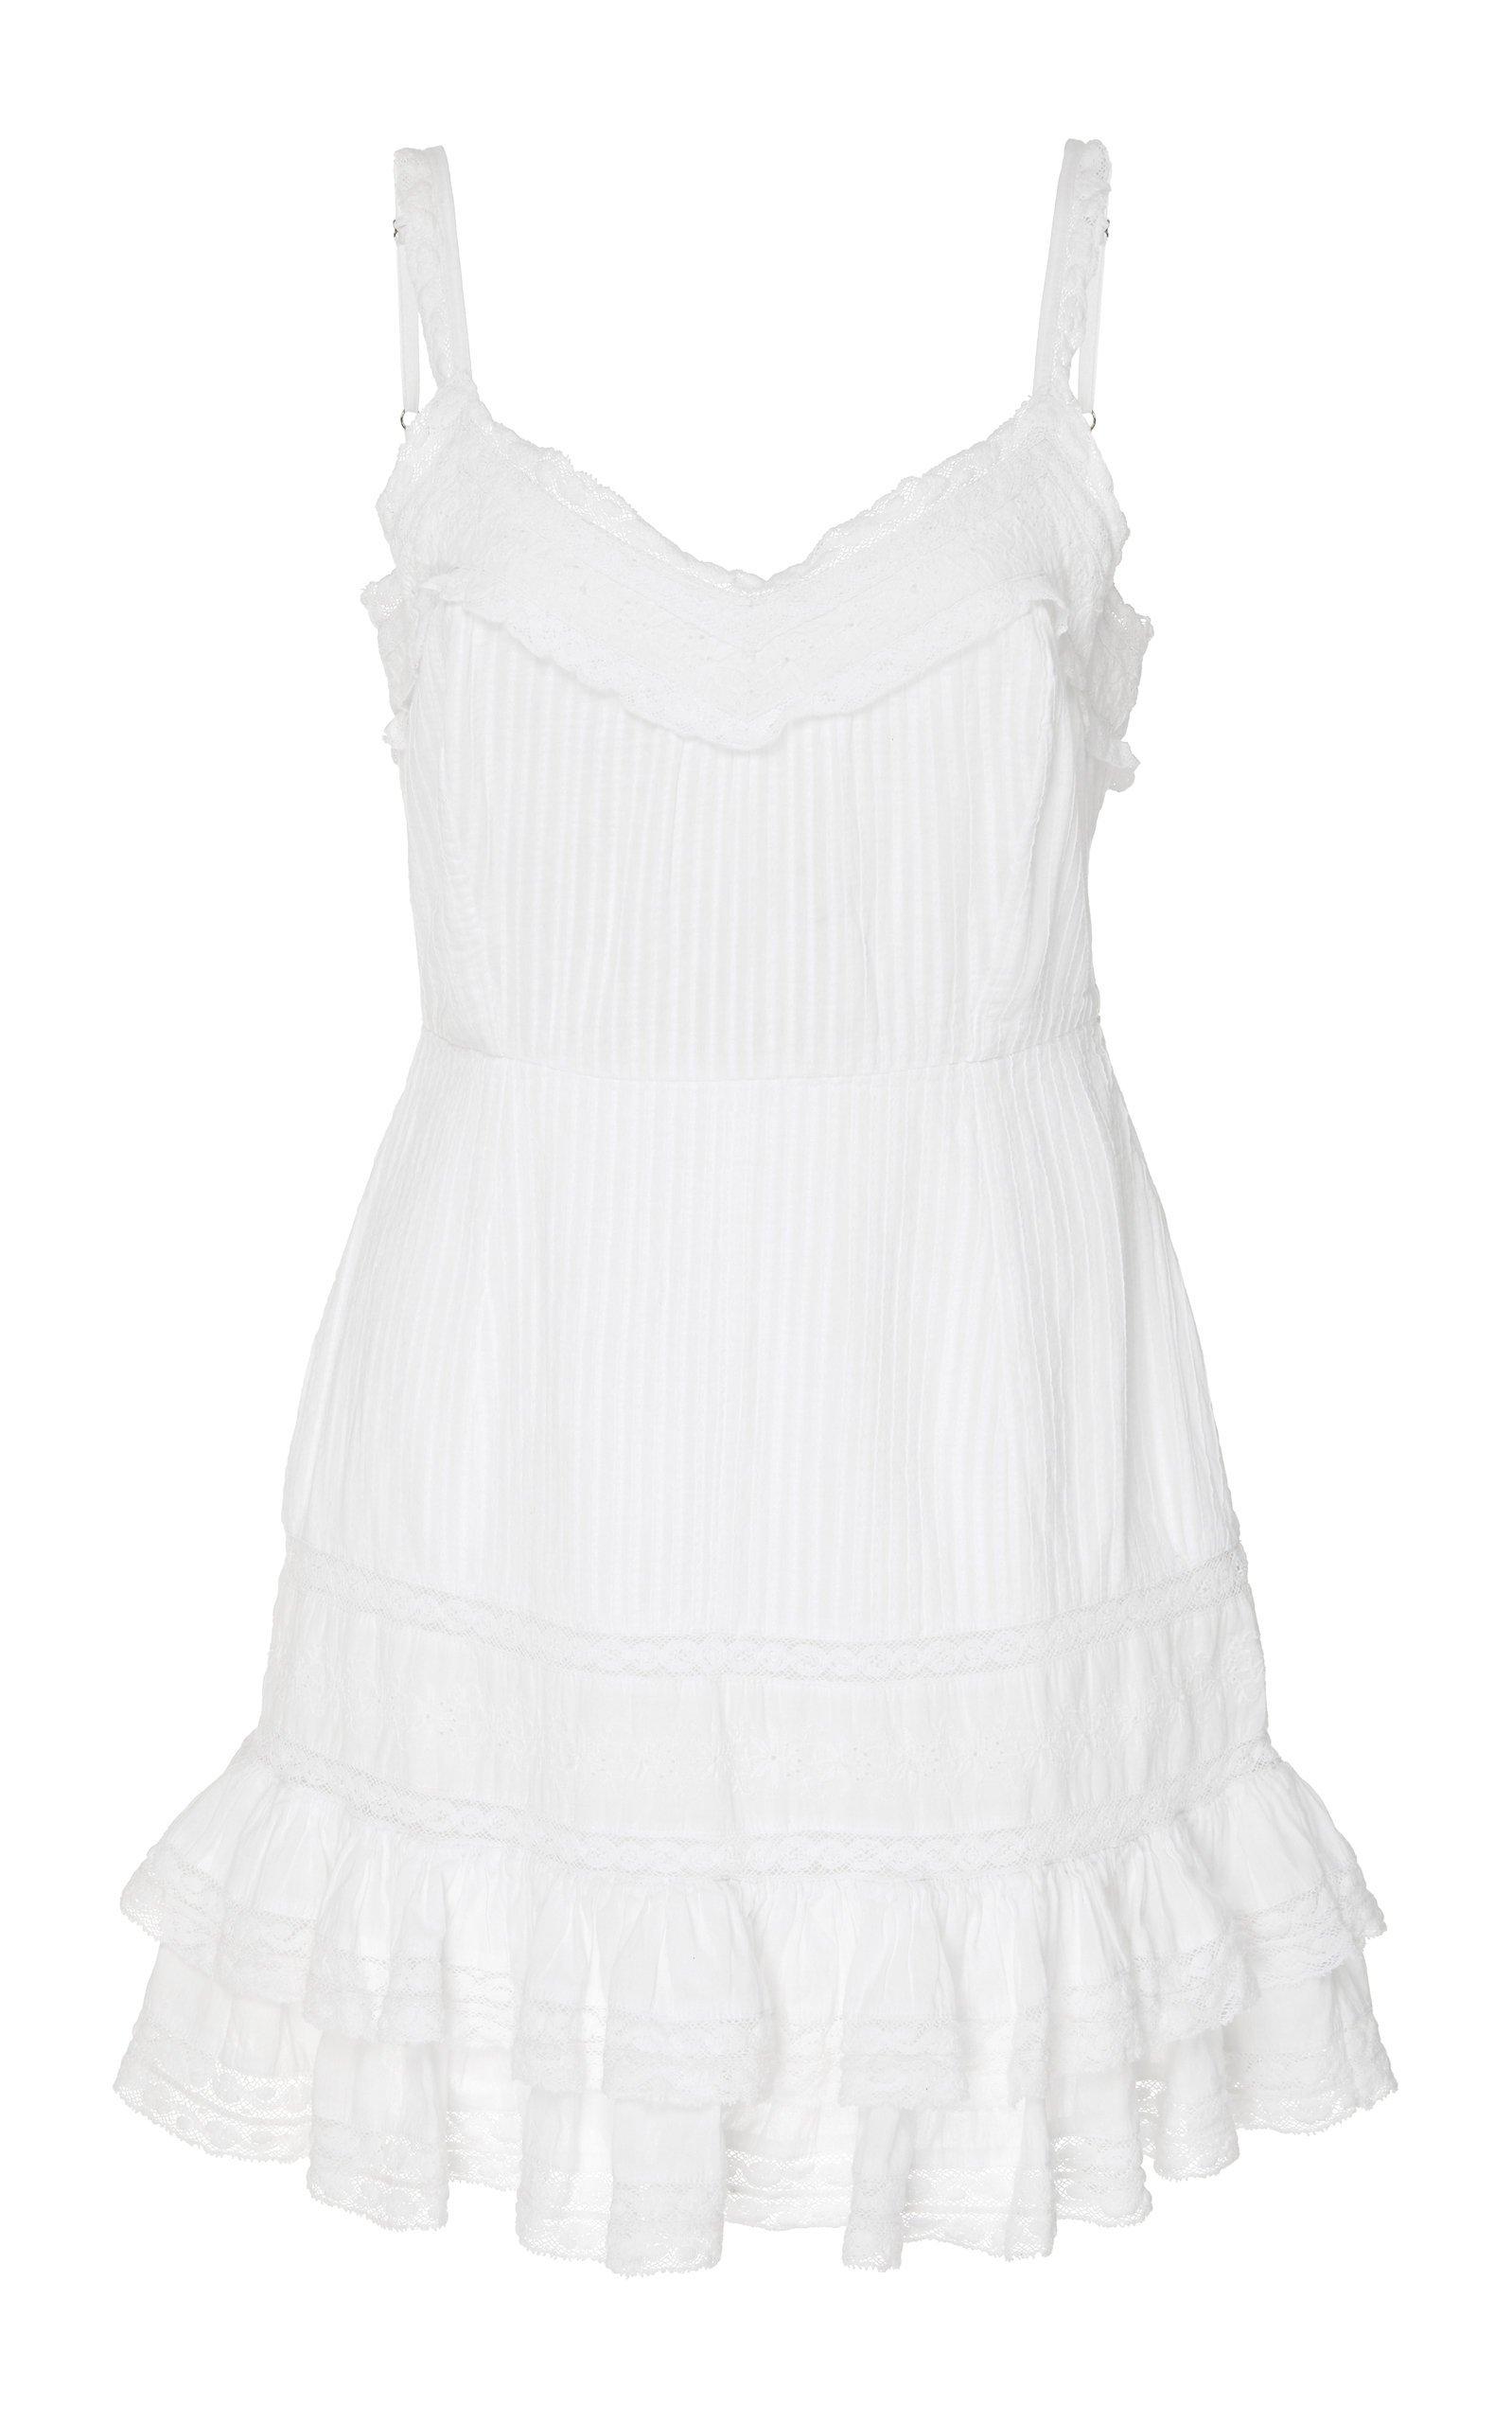 LoveShackFancy Tallulah Ruffled Lace-Trimmed Cotton Mini Dress Size: